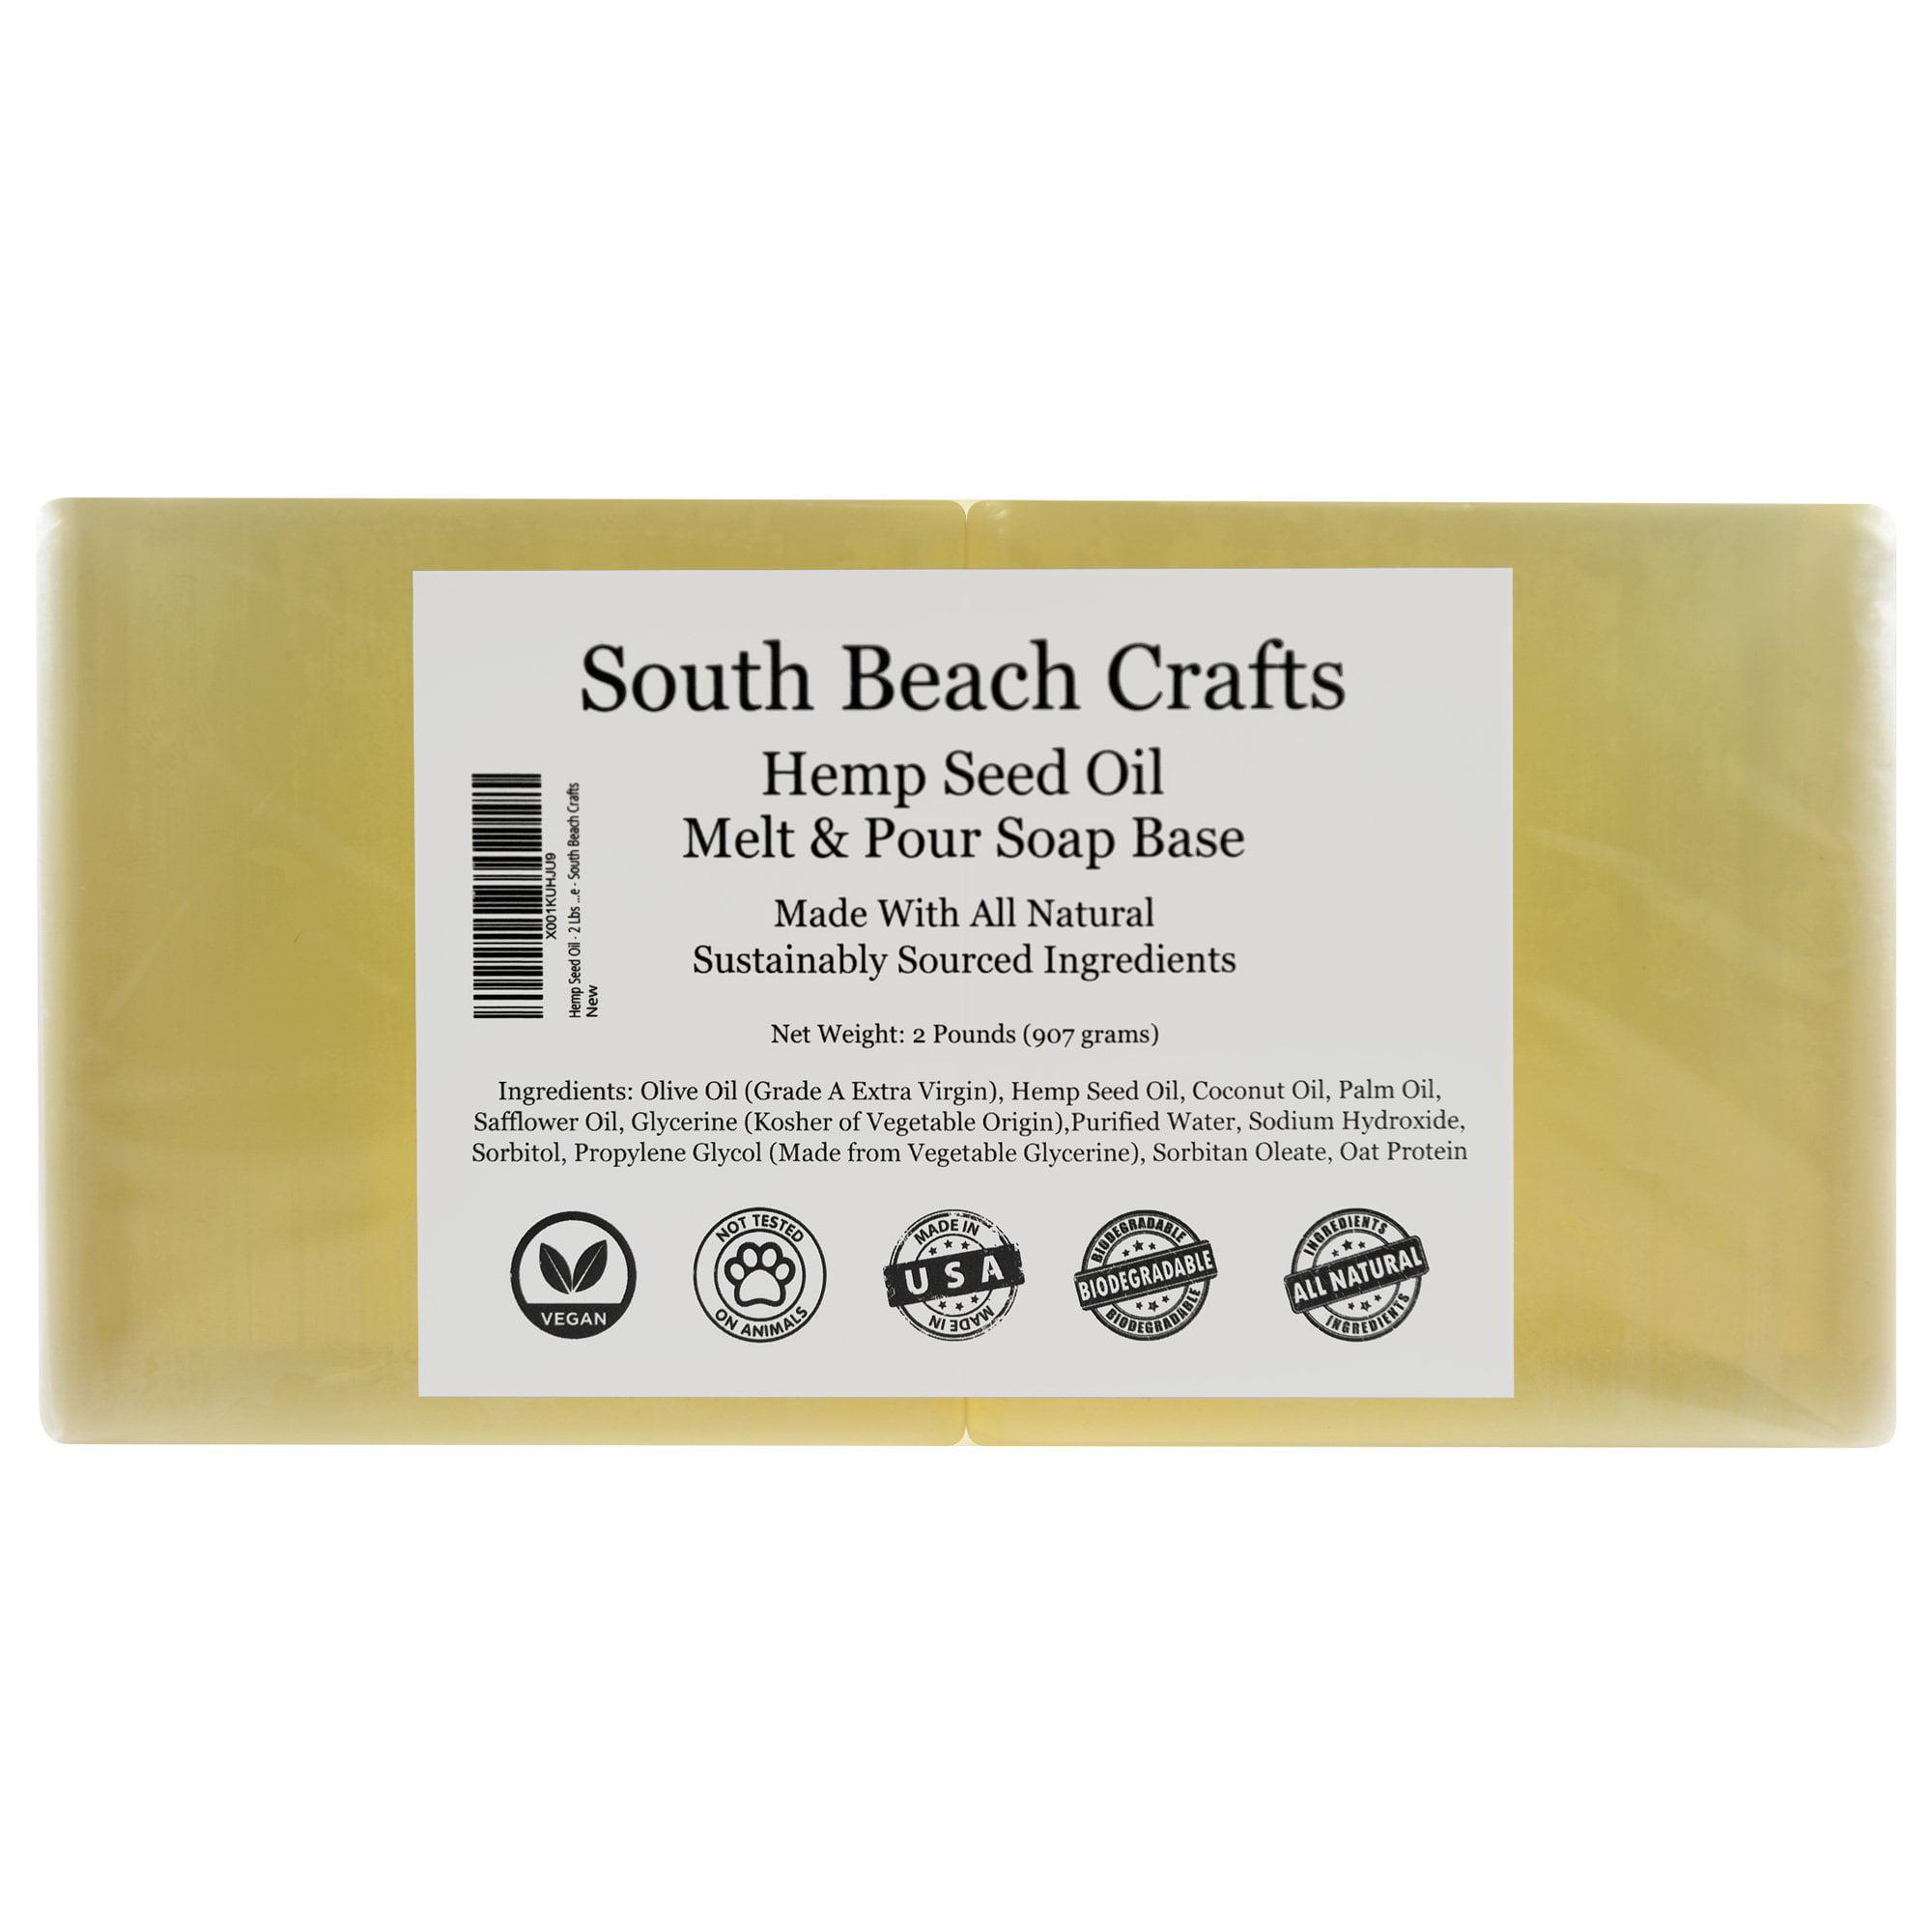 Hemp Seed Oil 2 Lbs Melt And Pour Soap Base South Beach Crafts Walmart Com Walmart Com